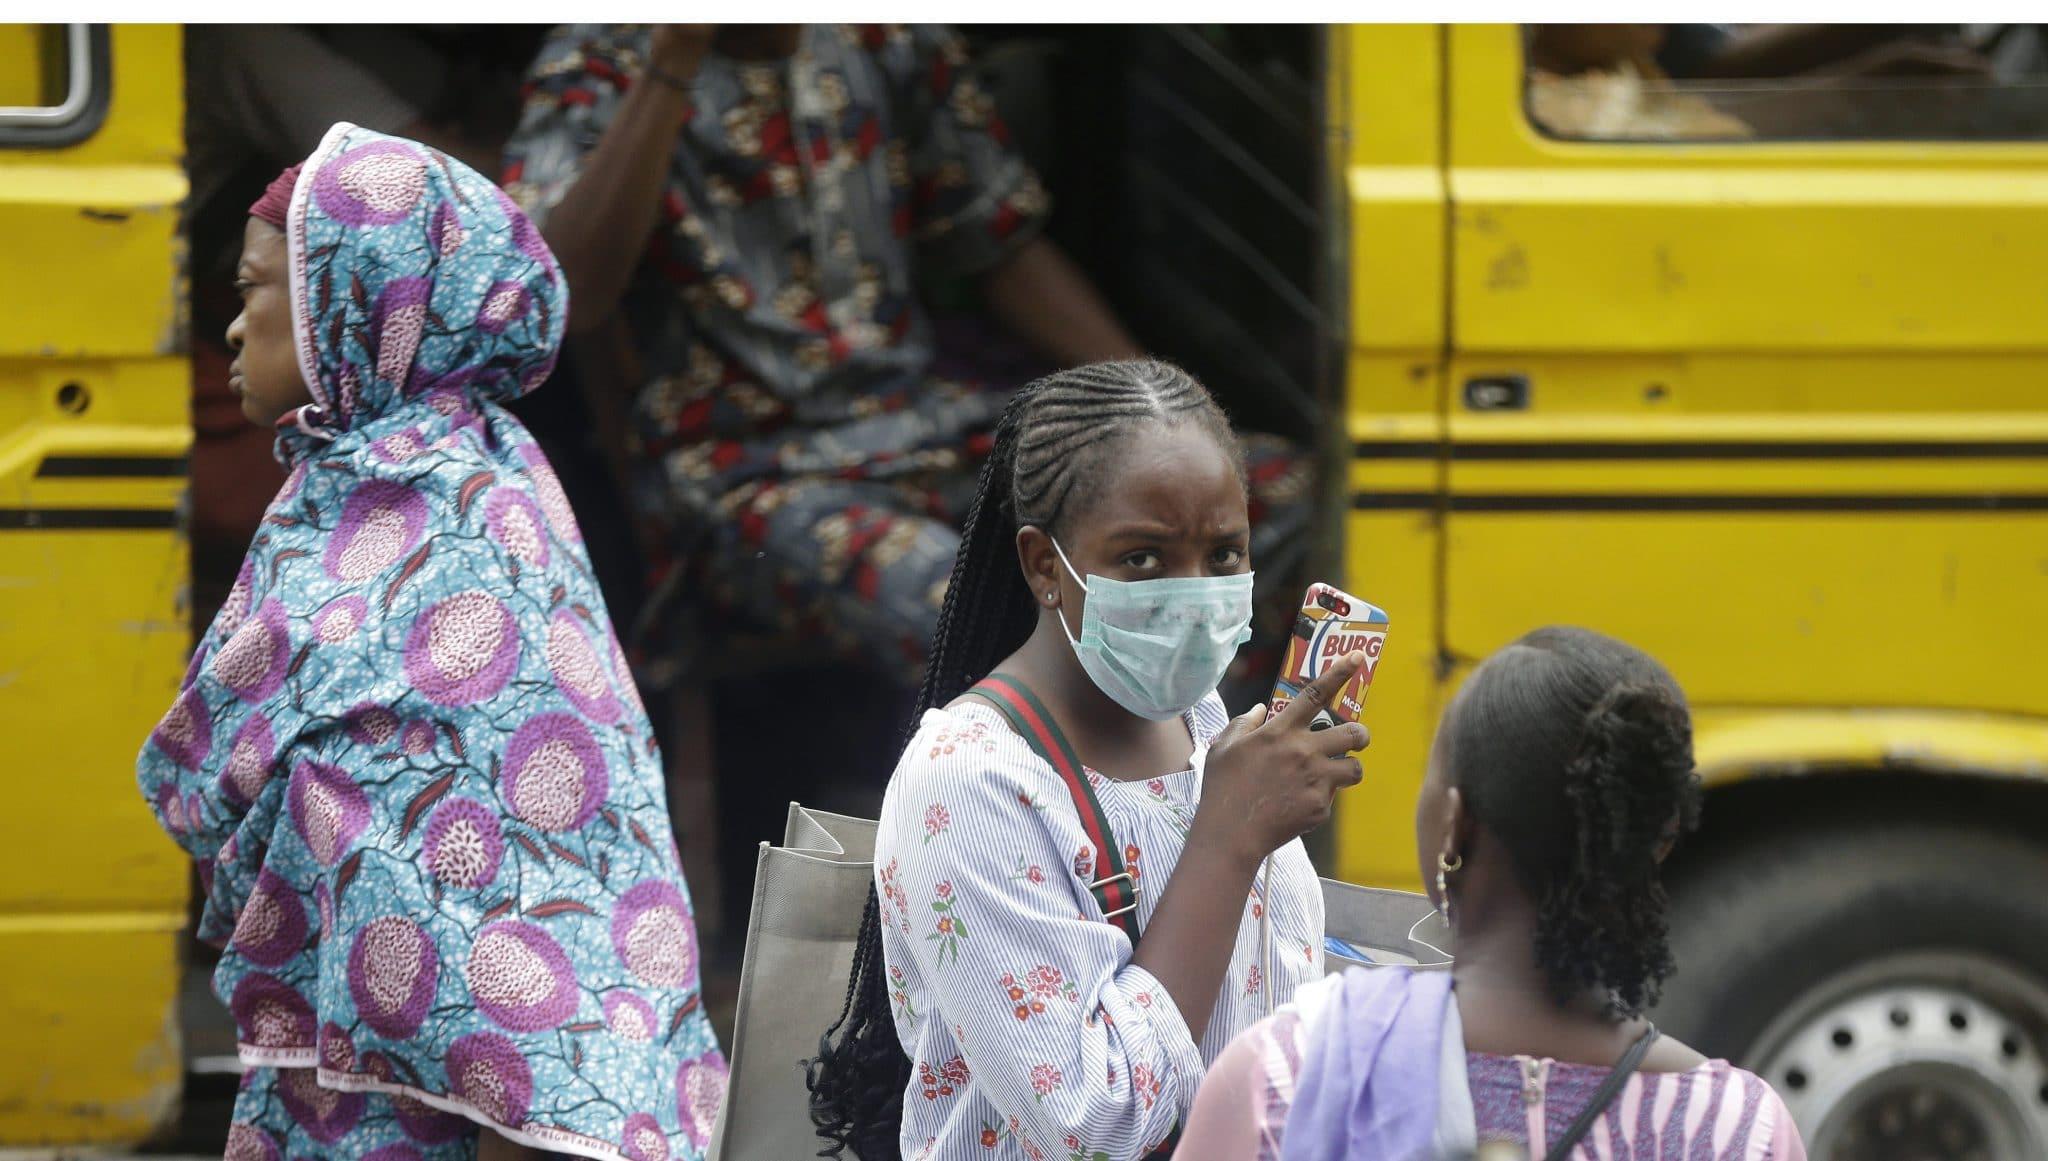 Nigeria records 1301 new COVID-19 cases, 15 more deaths